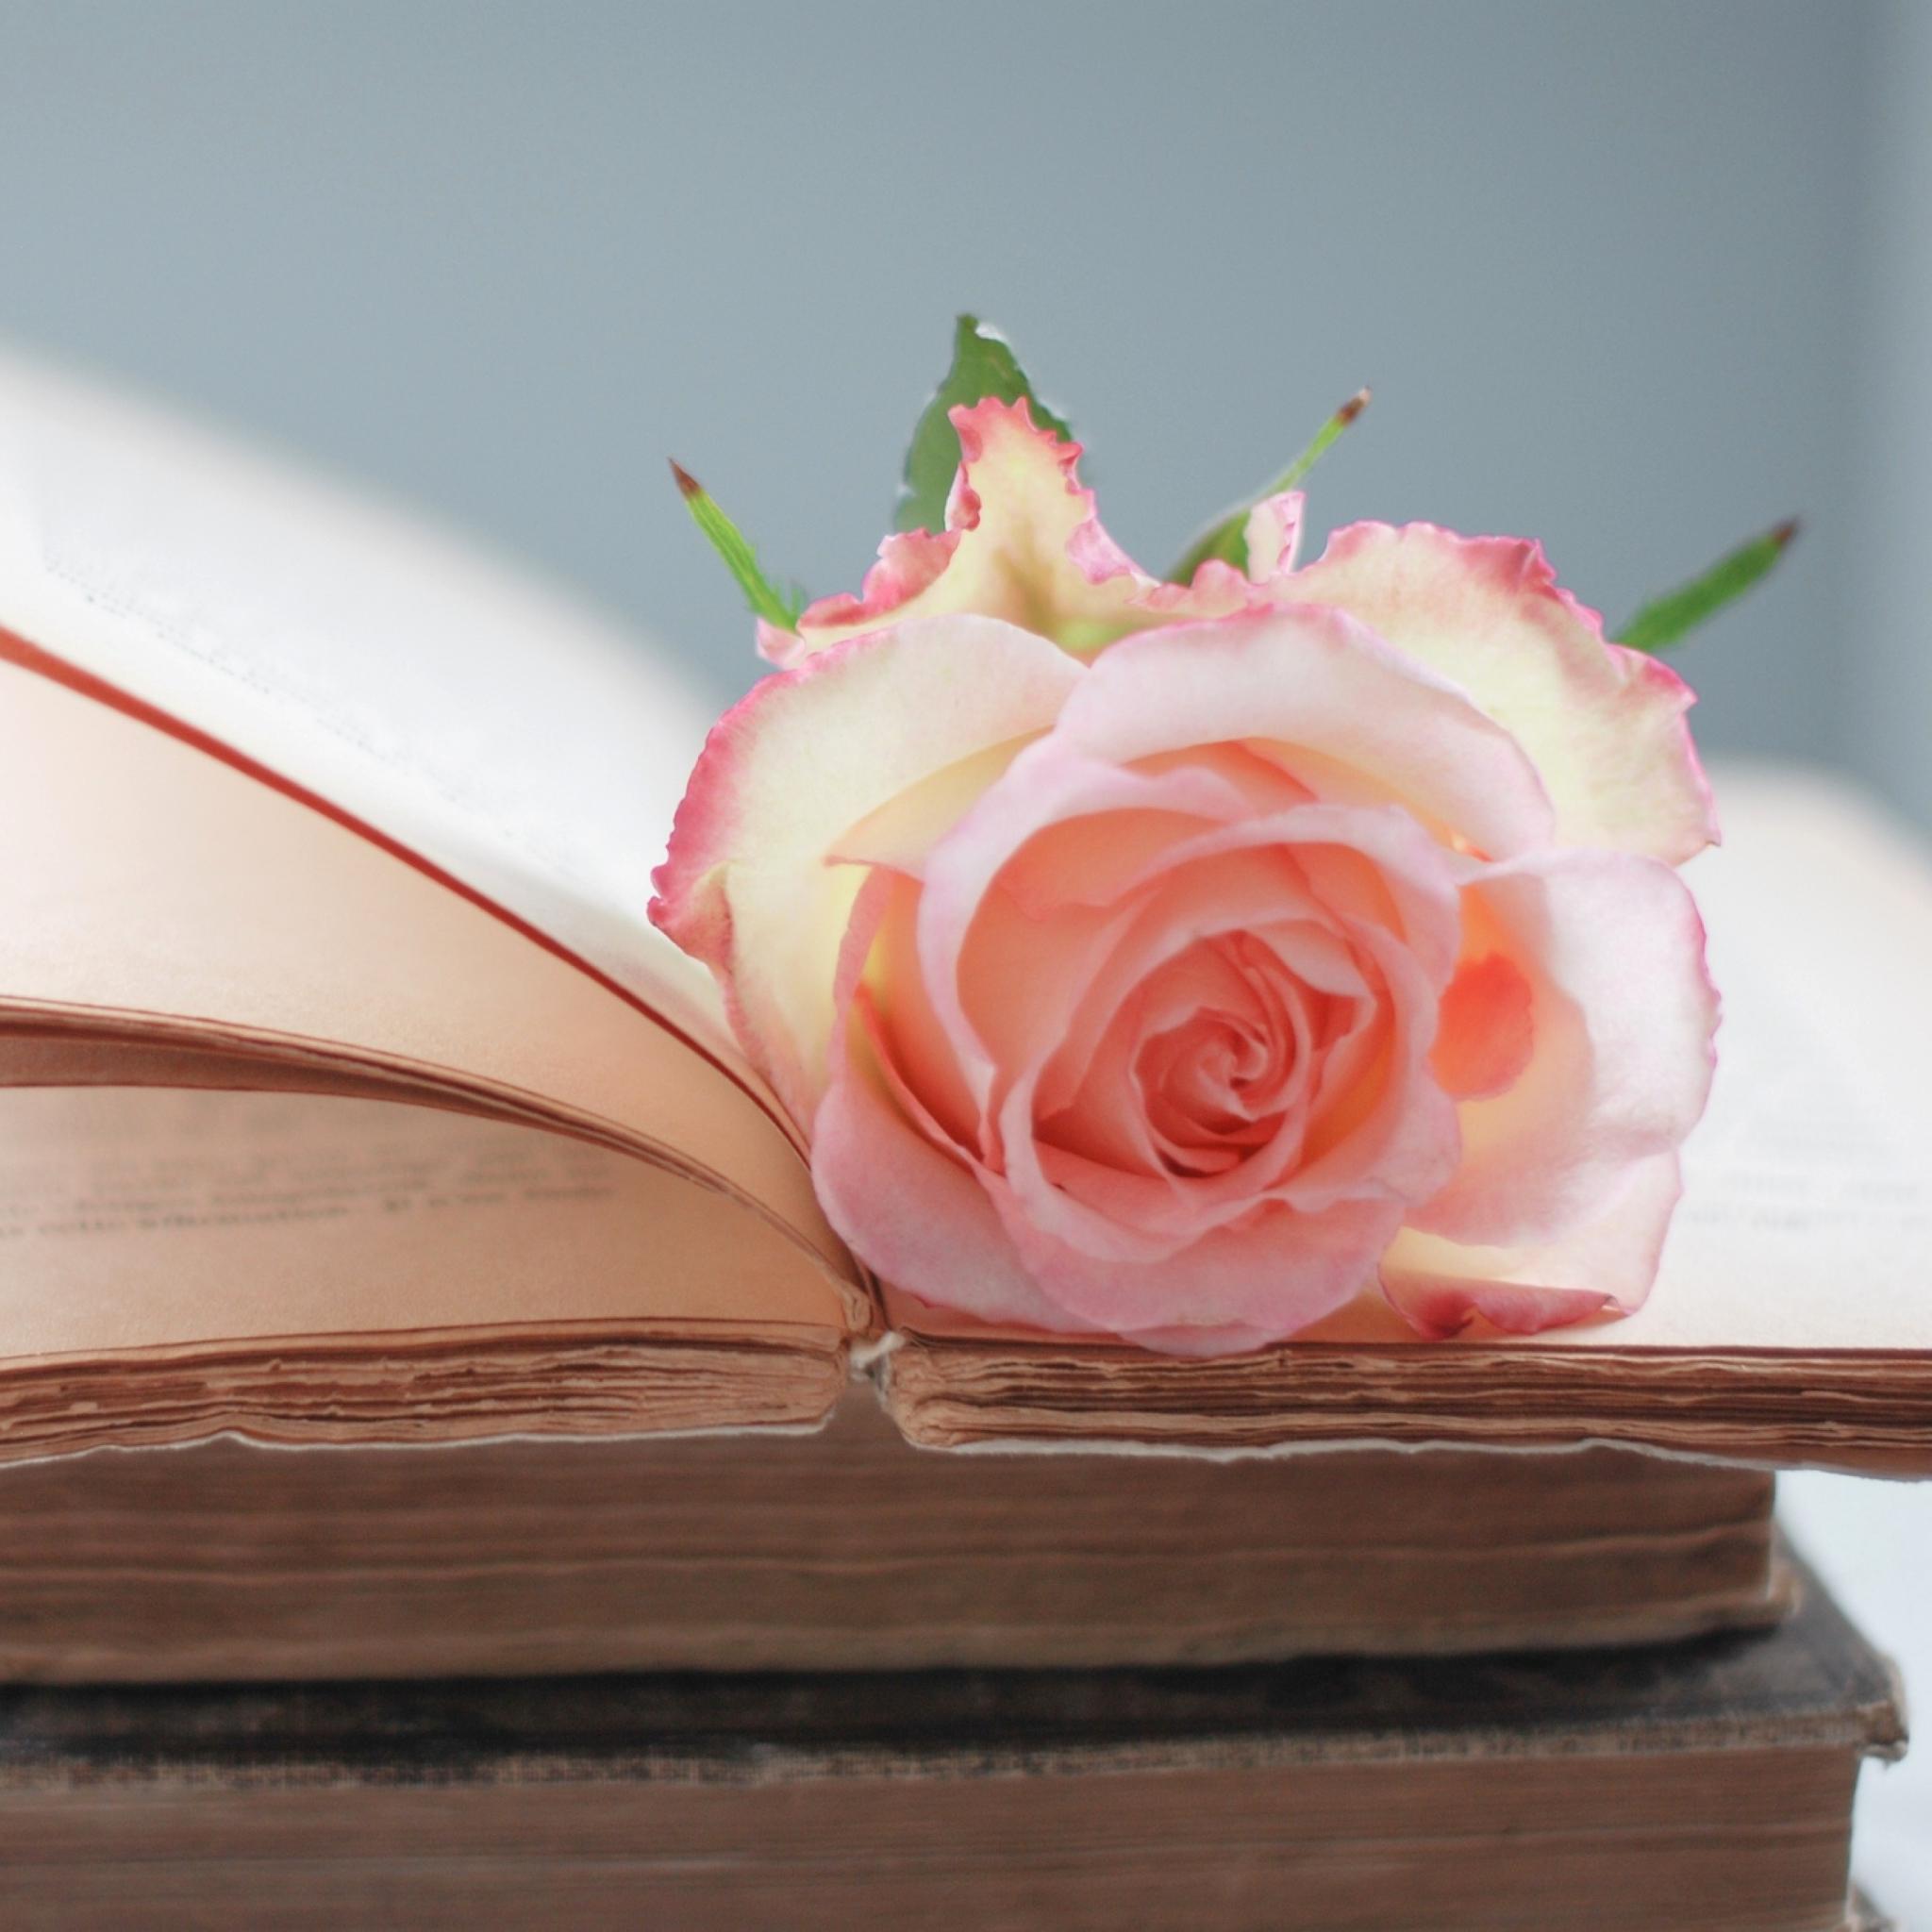 любовь цветок роза книга бесплатно